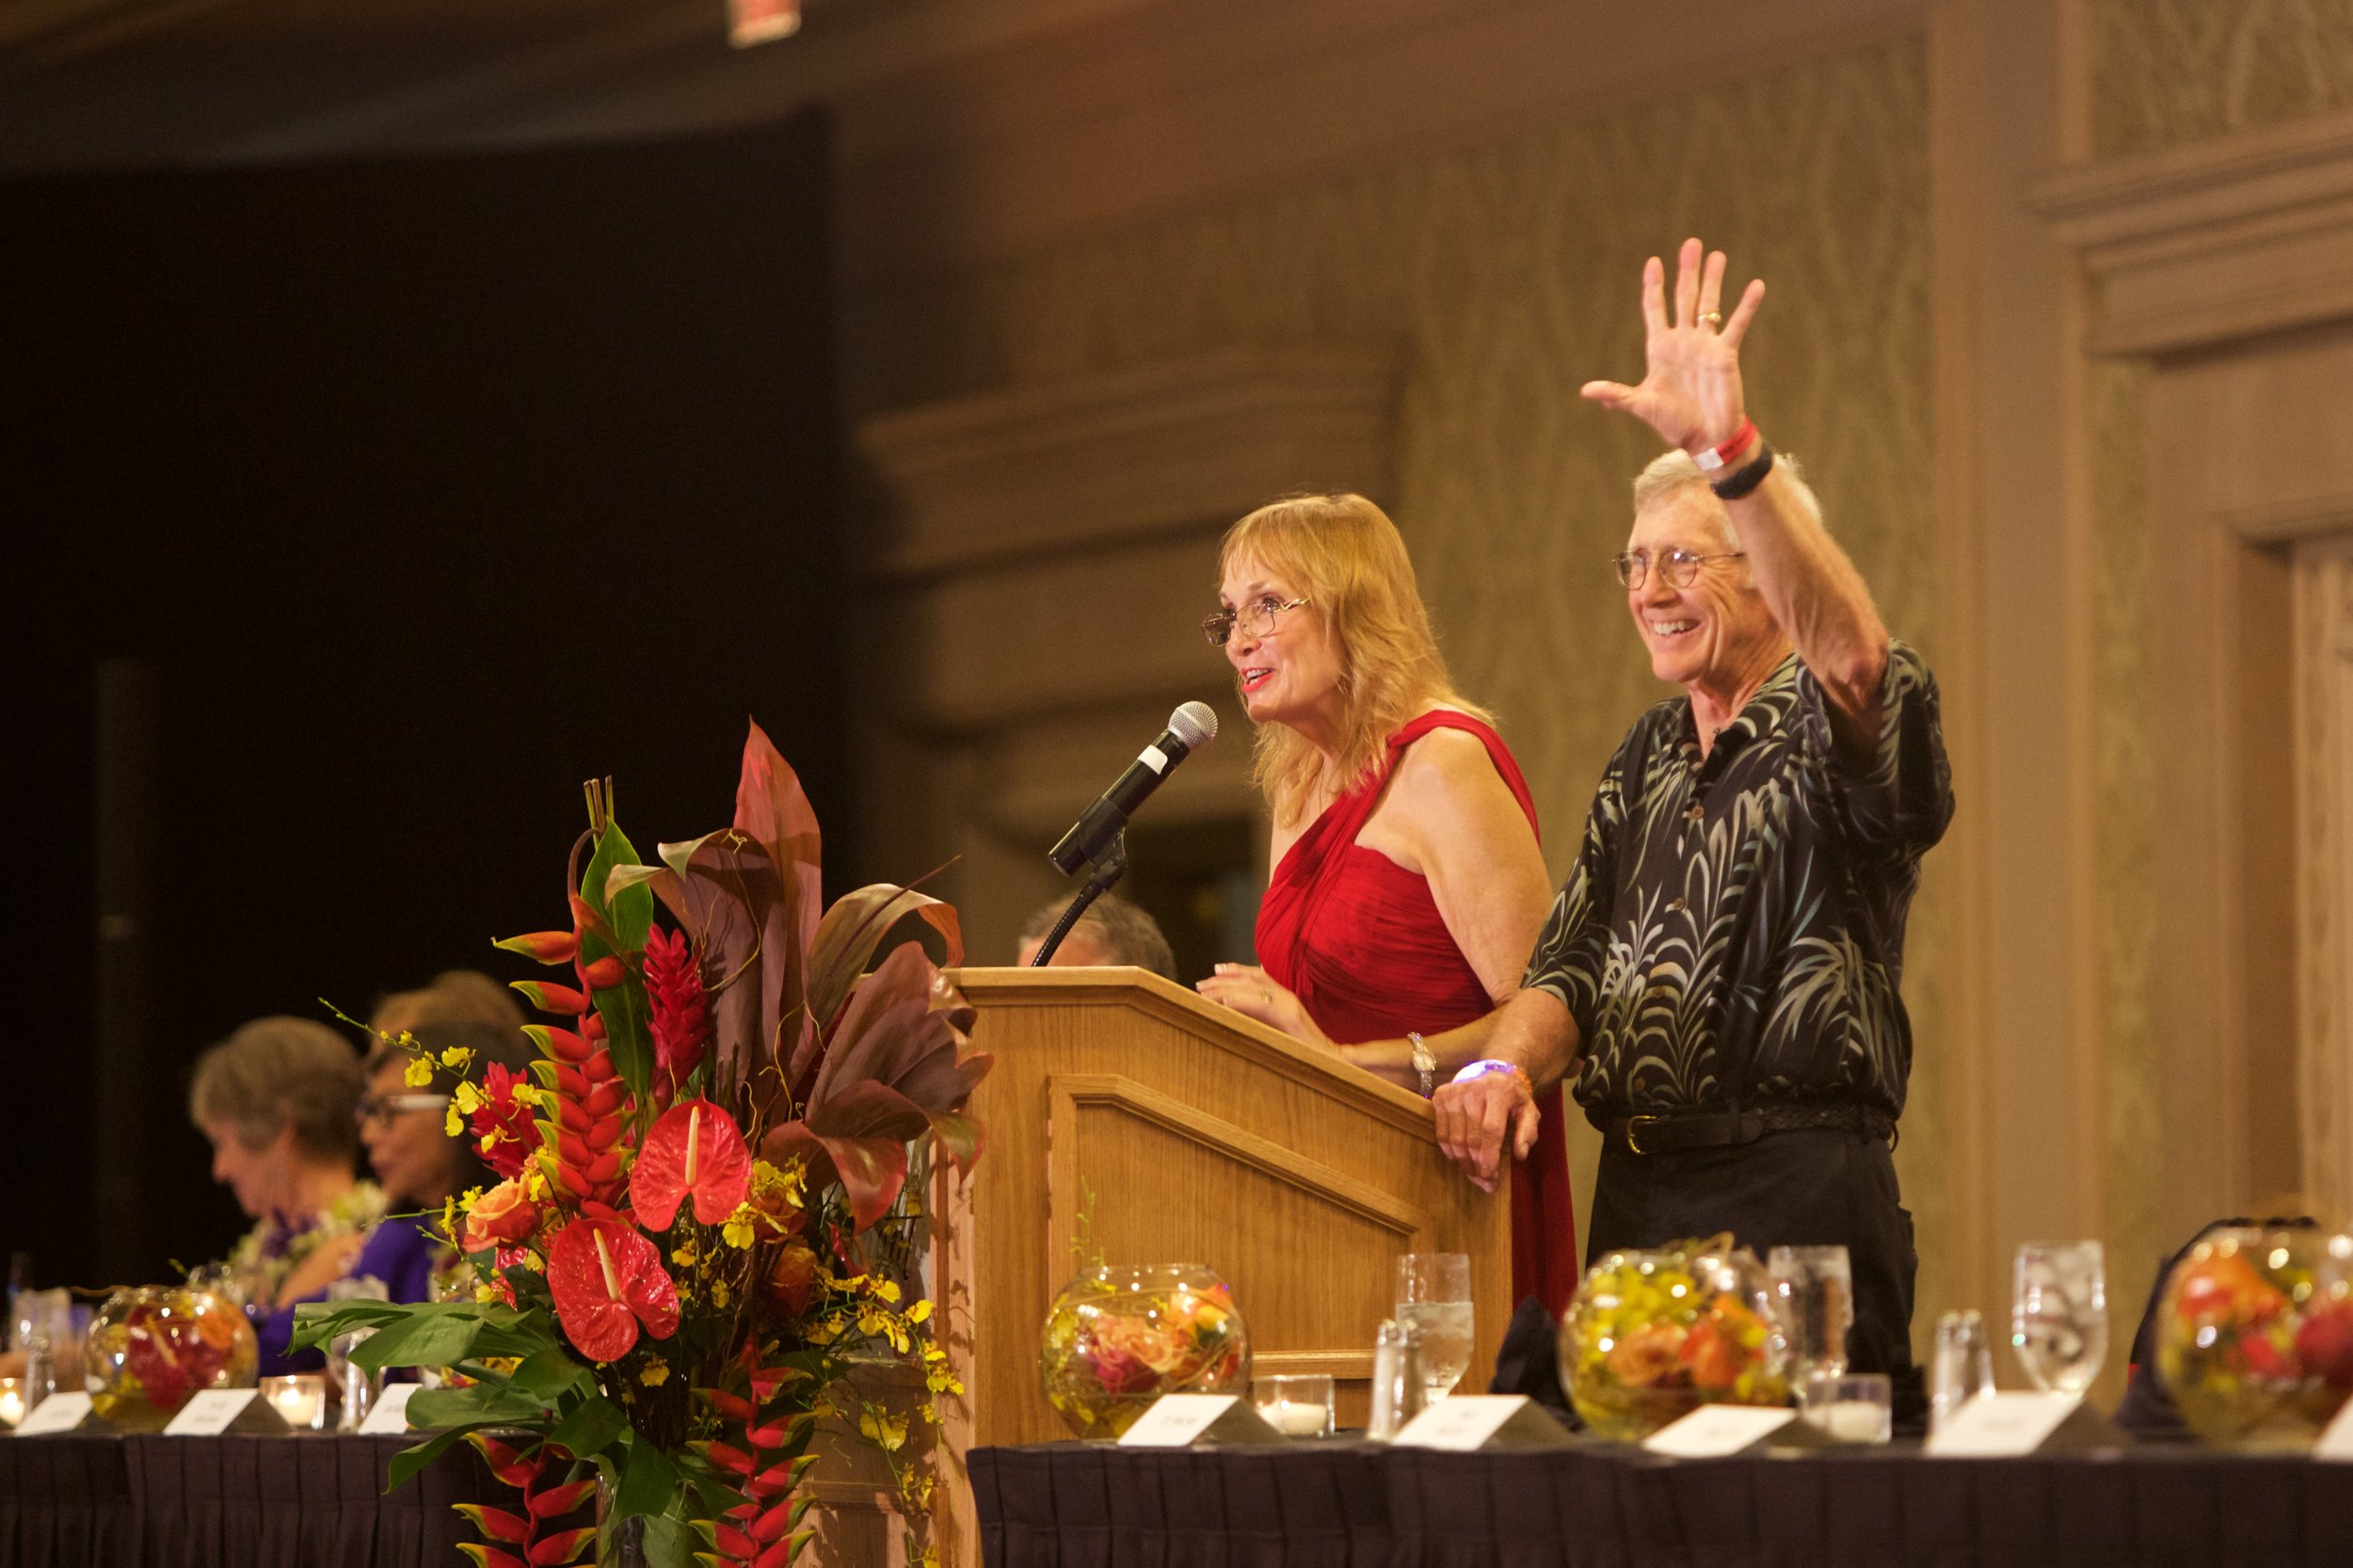 Laura and Frank Sayre at the 2018 The Daniel R. Sayre Memorial Foundation dinner. PHOTO: Eric J. Franke